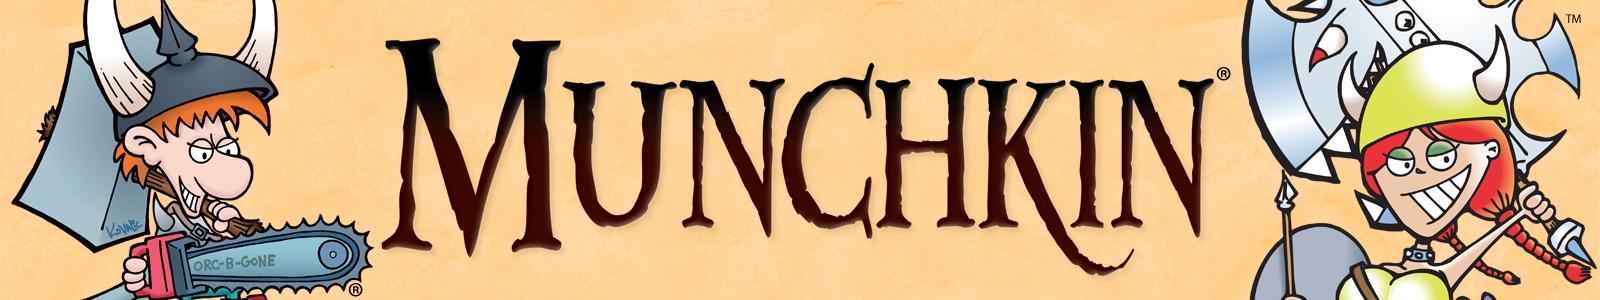 munchkin-game-site-banners-generic1.jpg